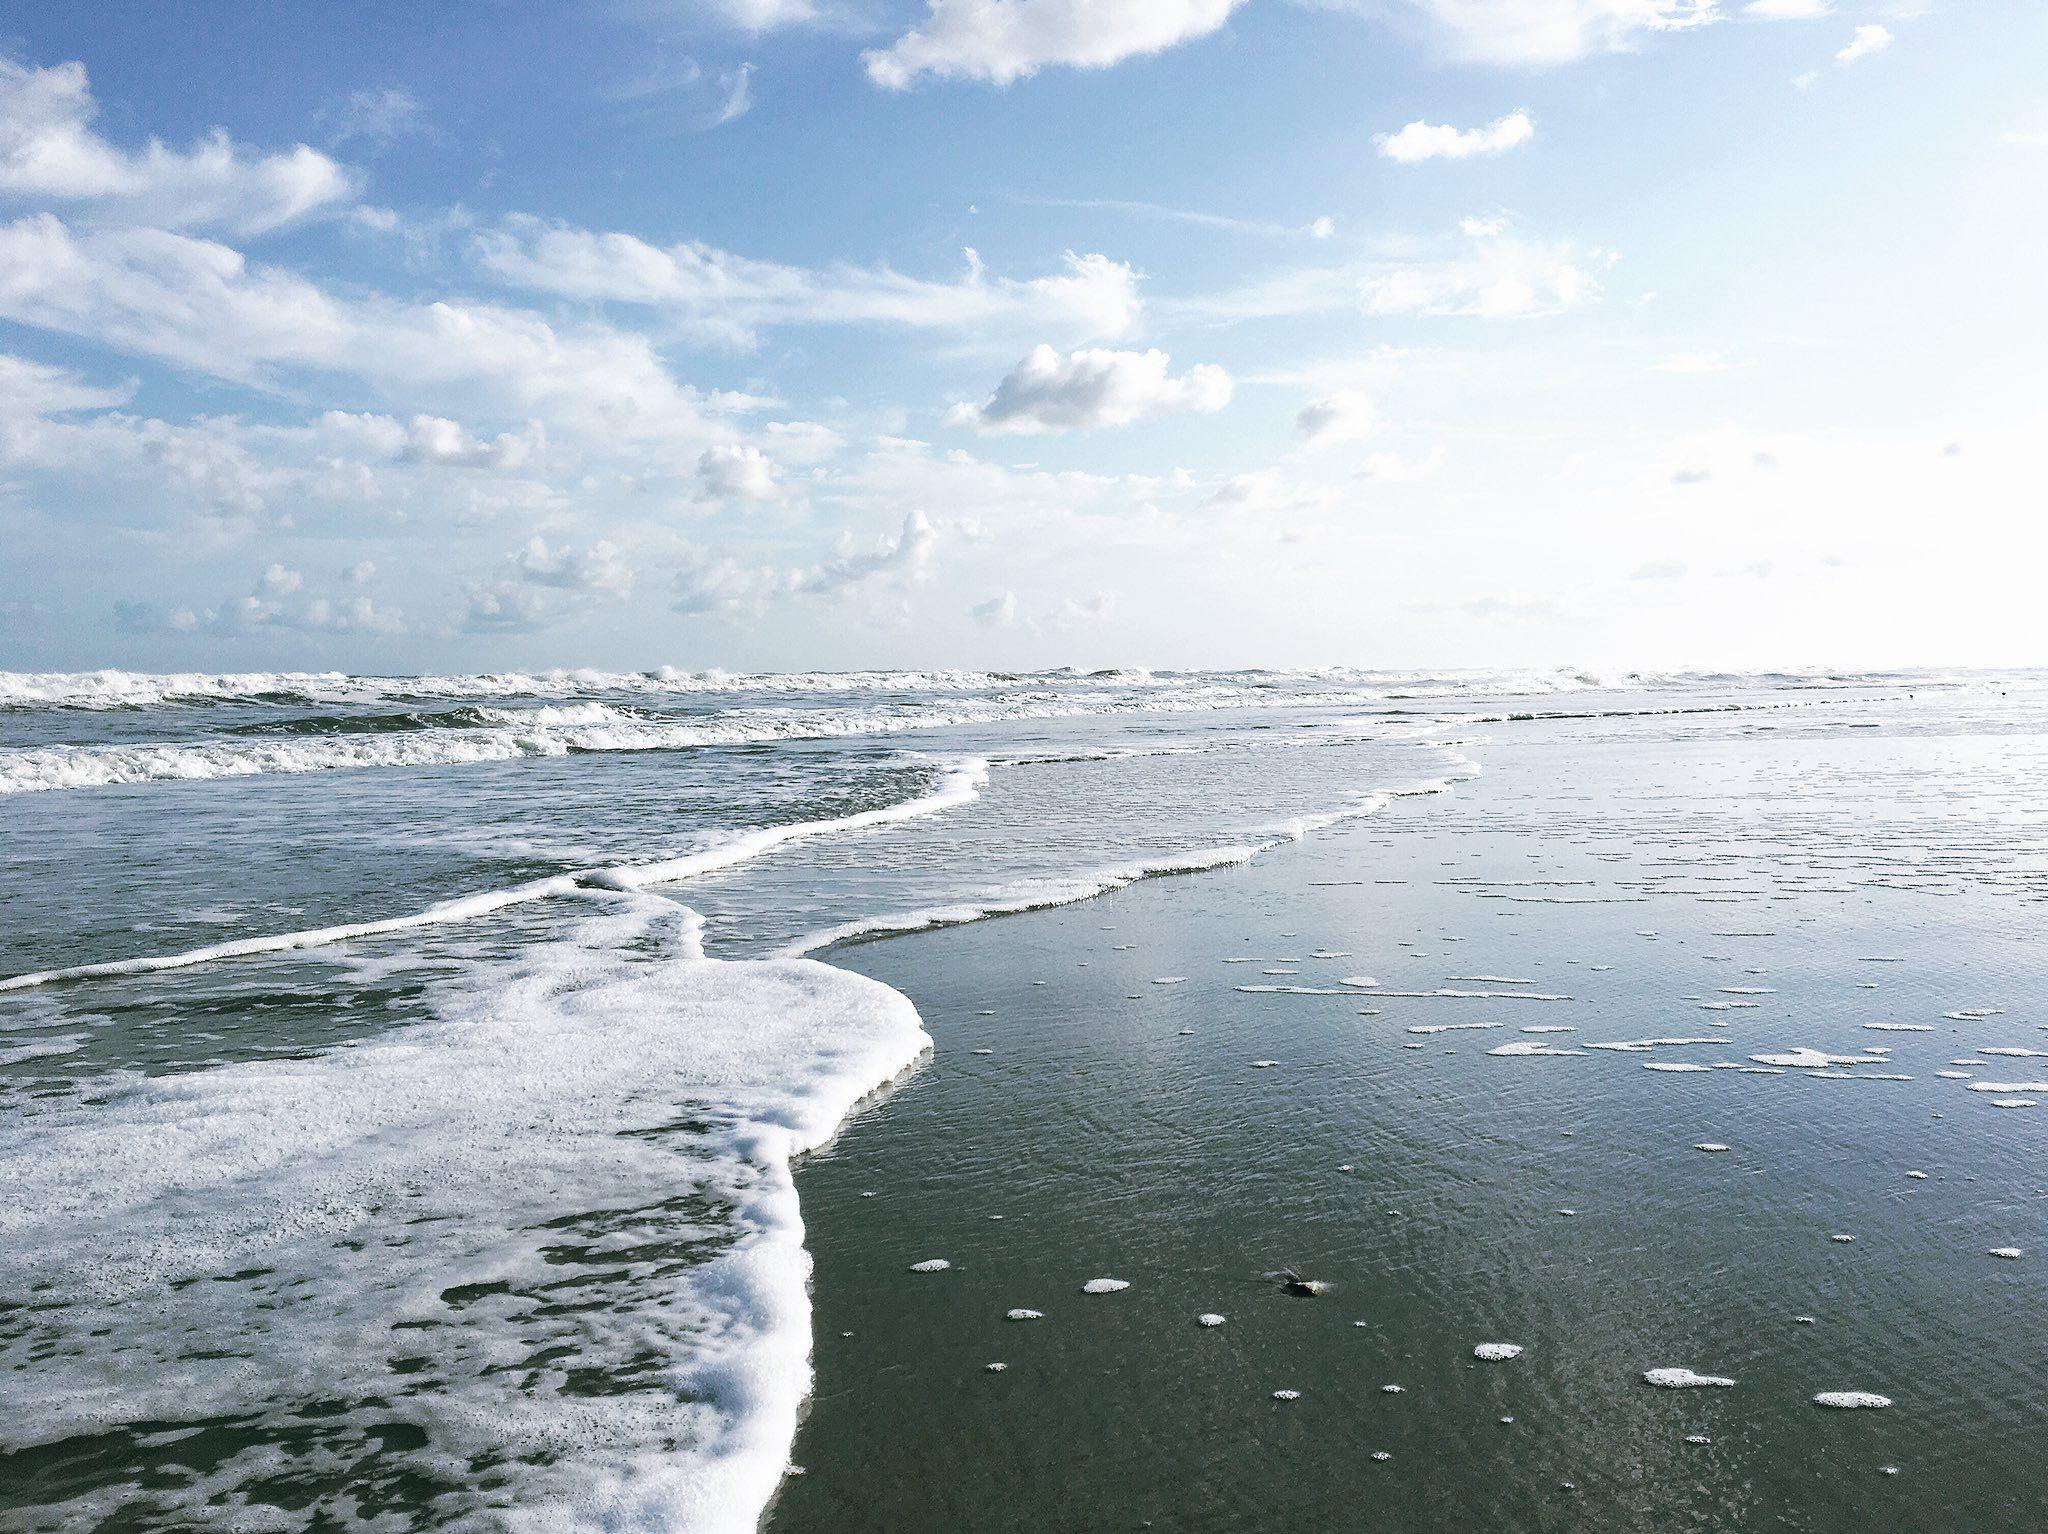 RT: #derrickloganphotography #Photography #beach #landscapephotography #iphone #apple https://t.co/IYxdH7yGg1 via iamderricklogan #followme #photography